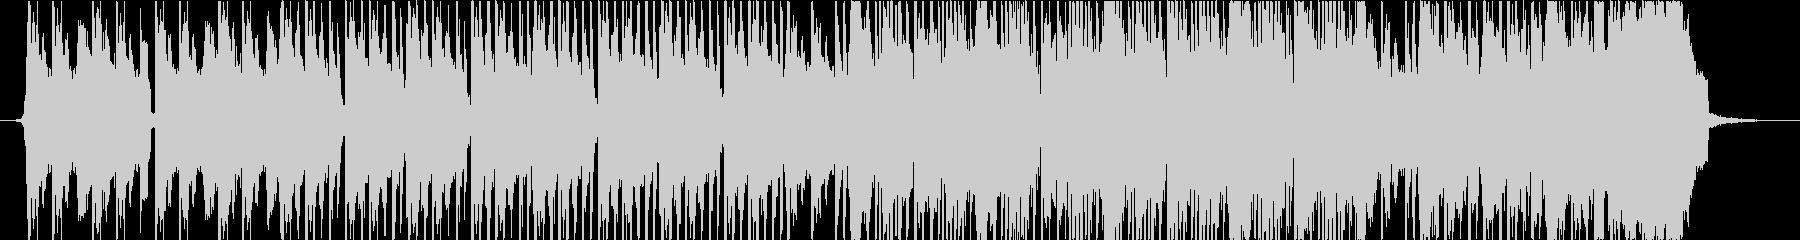 Percussion Musicの未再生の波形